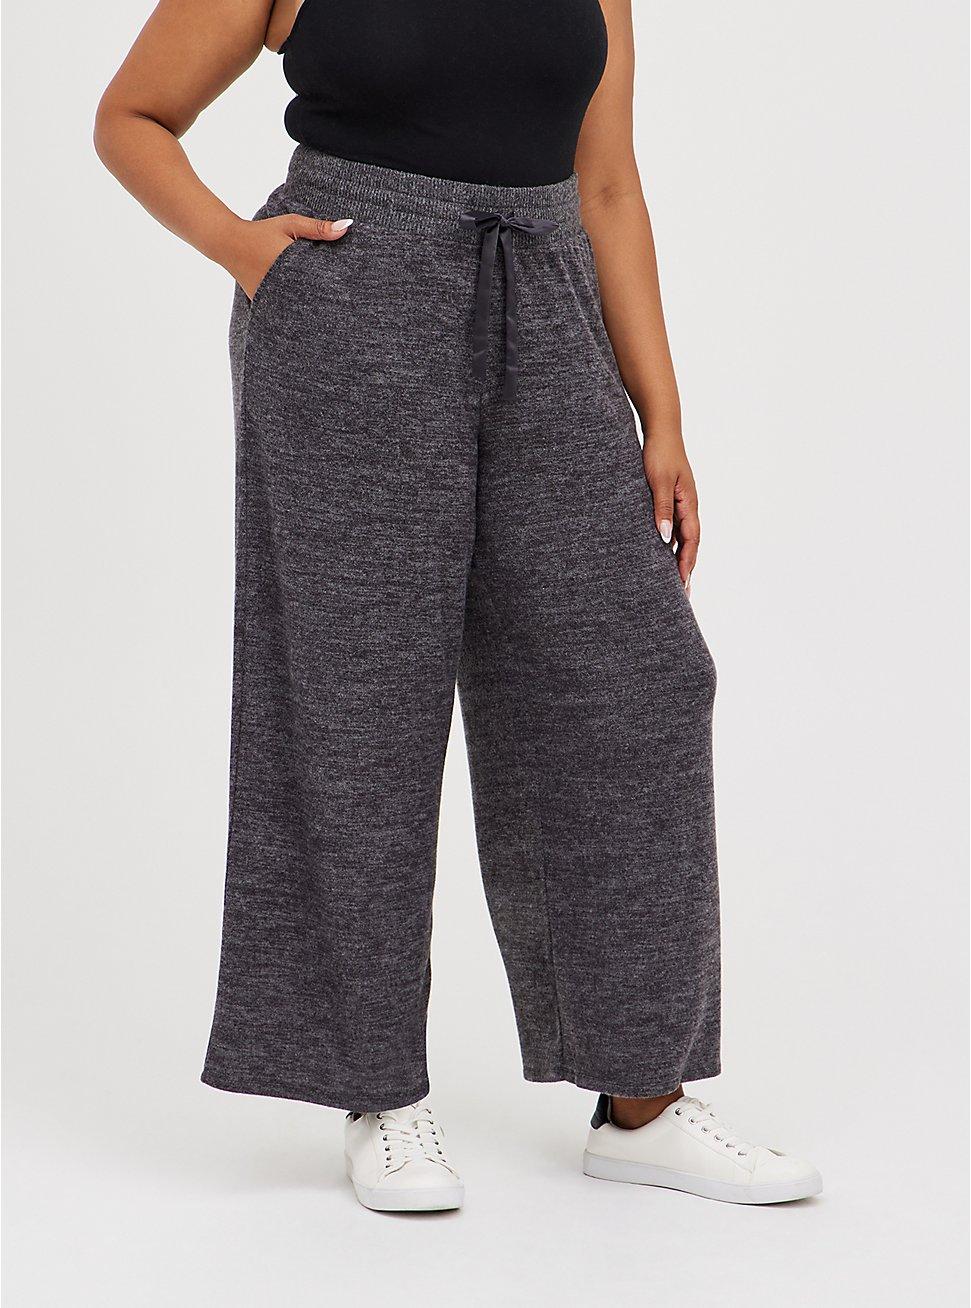 Plus Size Wide Leg Sleep Pant - Super Soft Plush Grey, CHARCOAL  GREY, hi-res